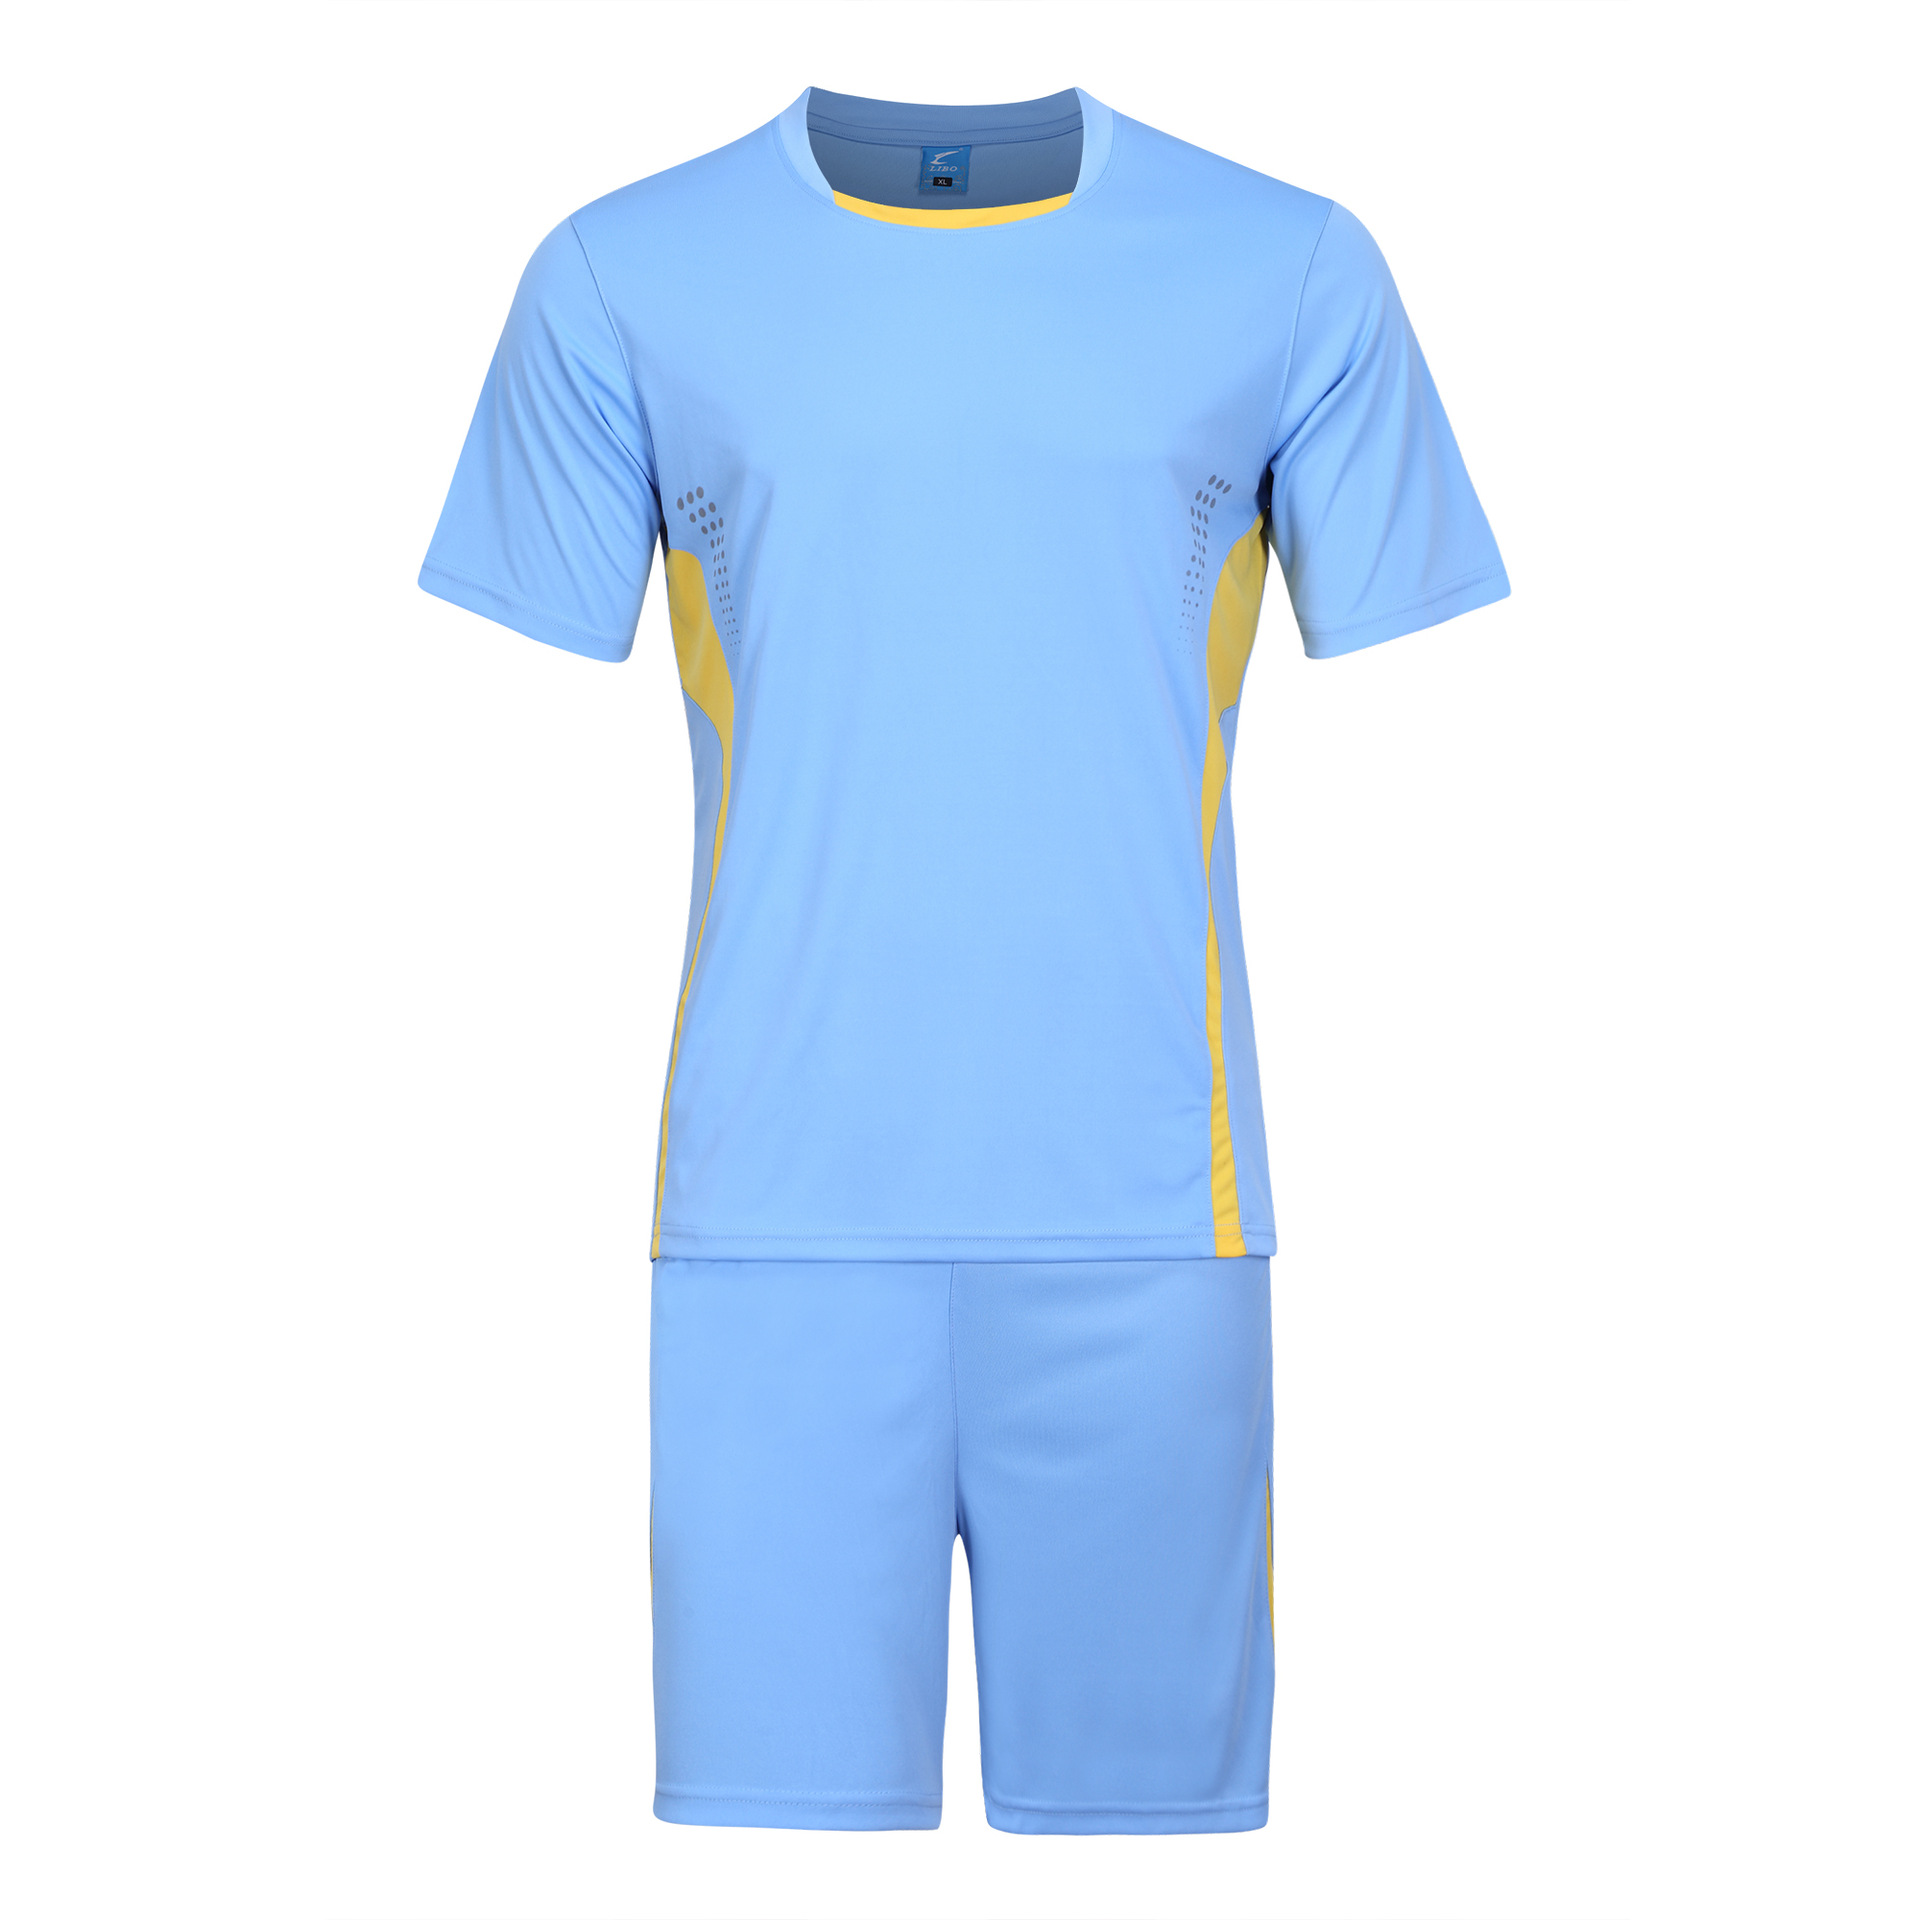 buy 2016 chelsea training suits chandal training suit uniforms shirts 16 17 maillot de foot. Black Bedroom Furniture Sets. Home Design Ideas